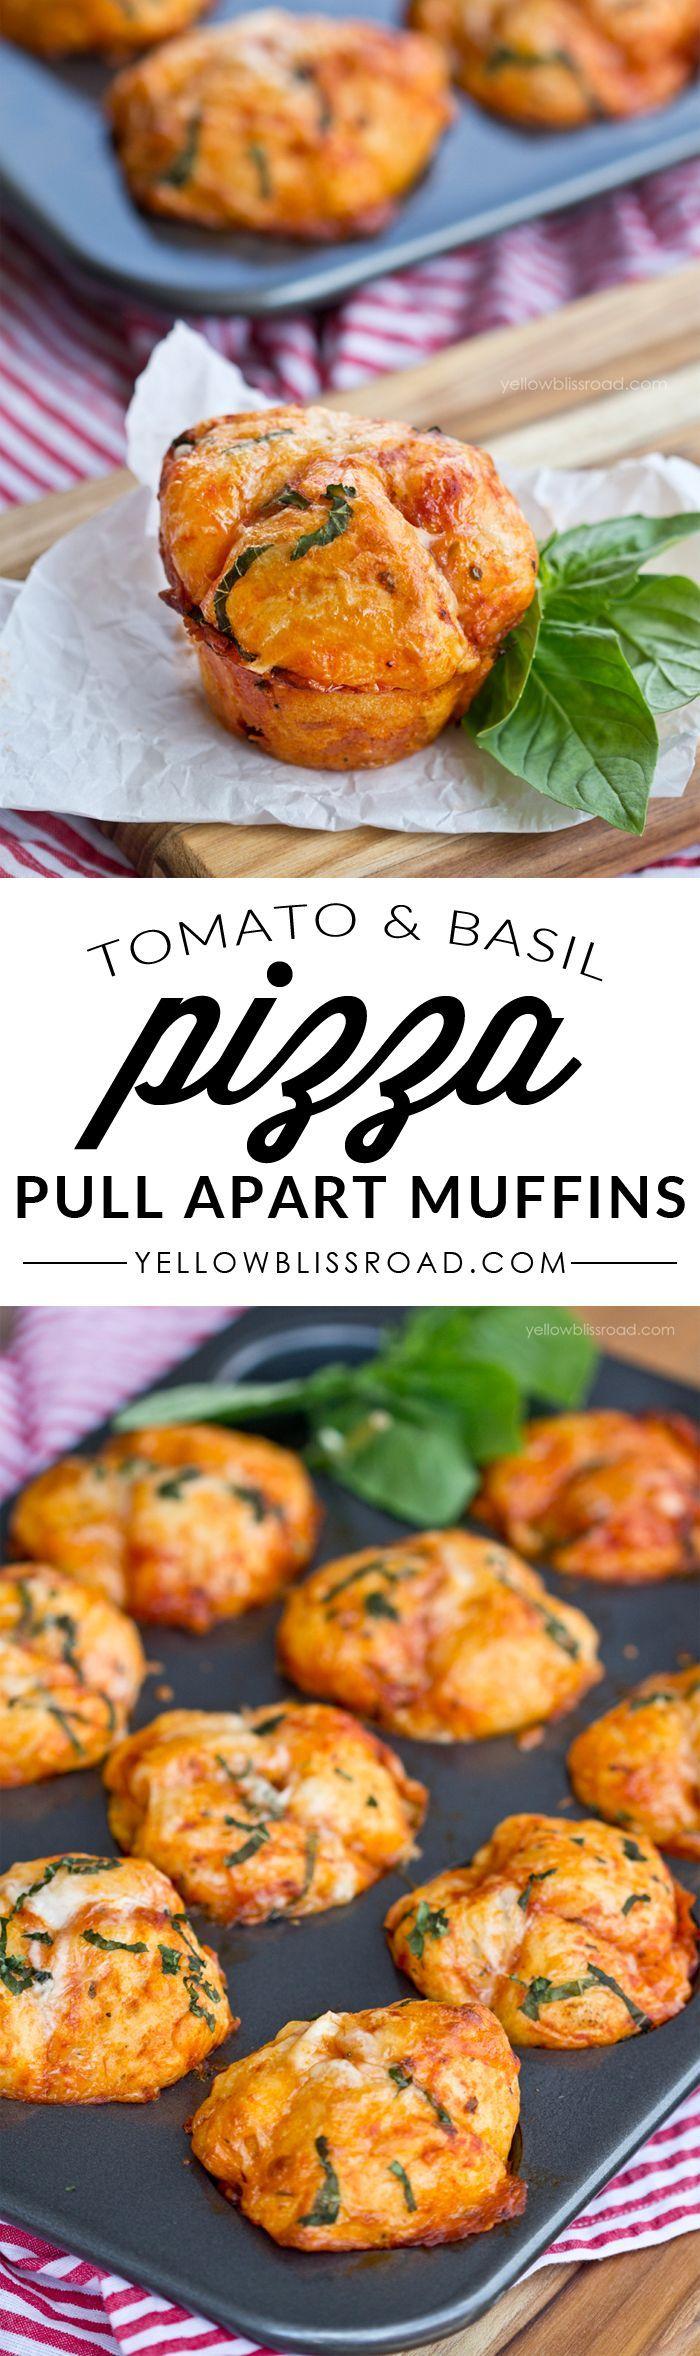 Tomato & Basil Pull Apart Pizza Muffins